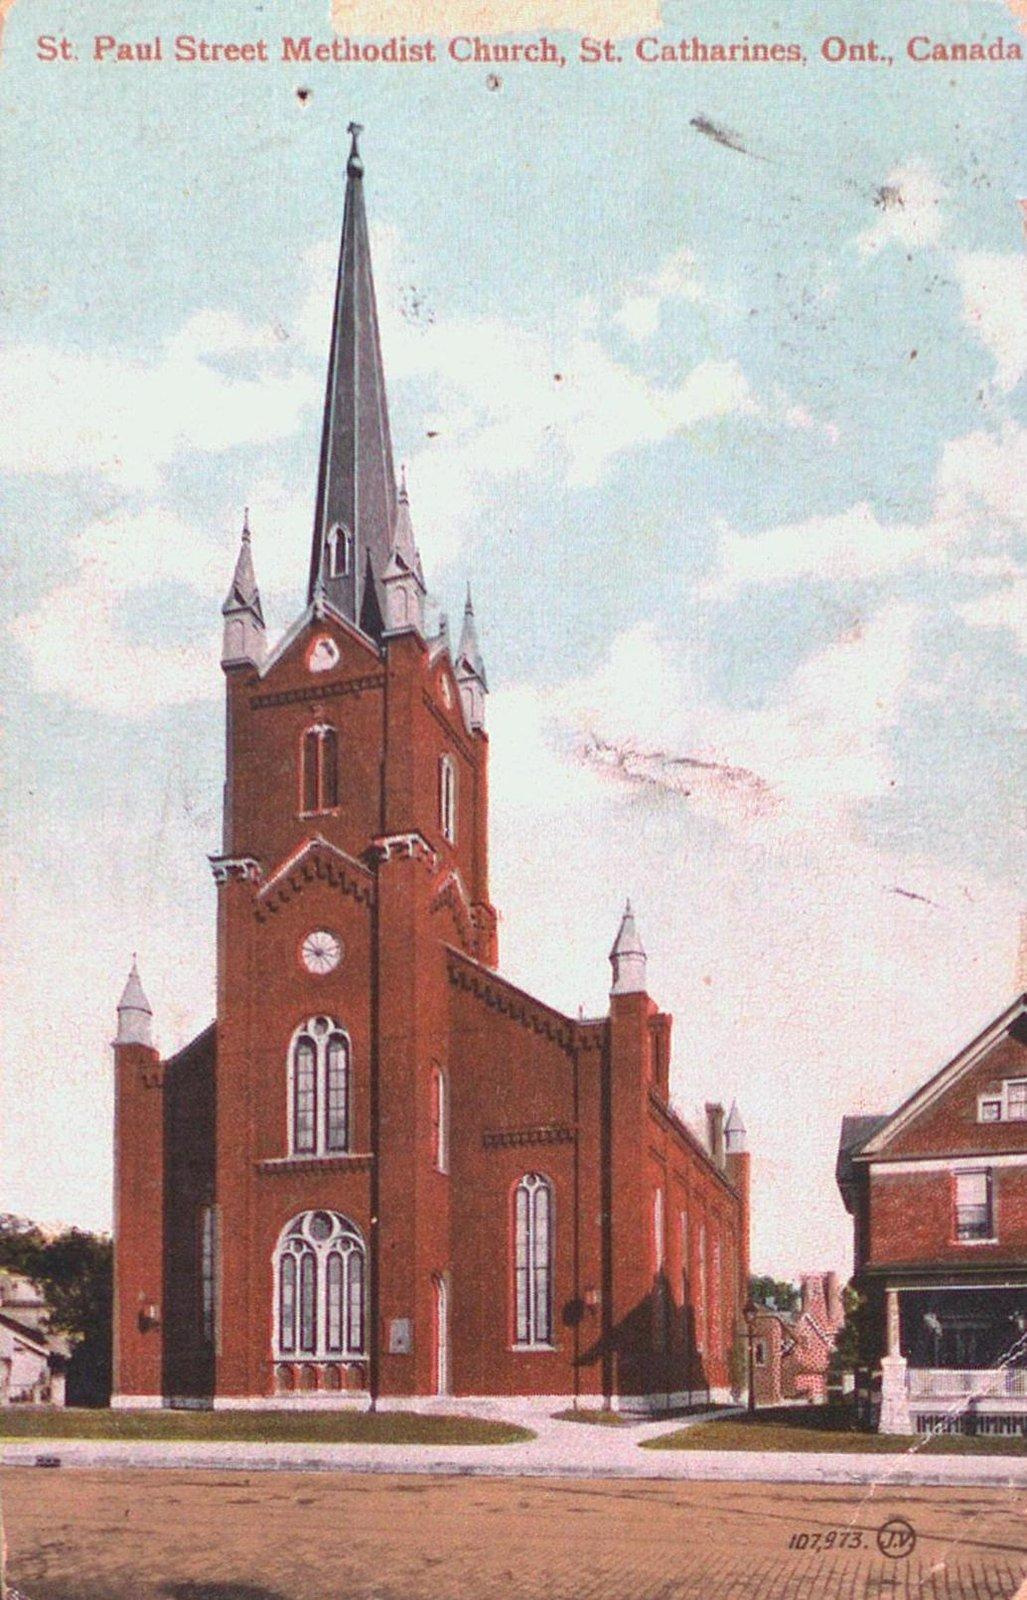 St. Paul Street Methodist Church